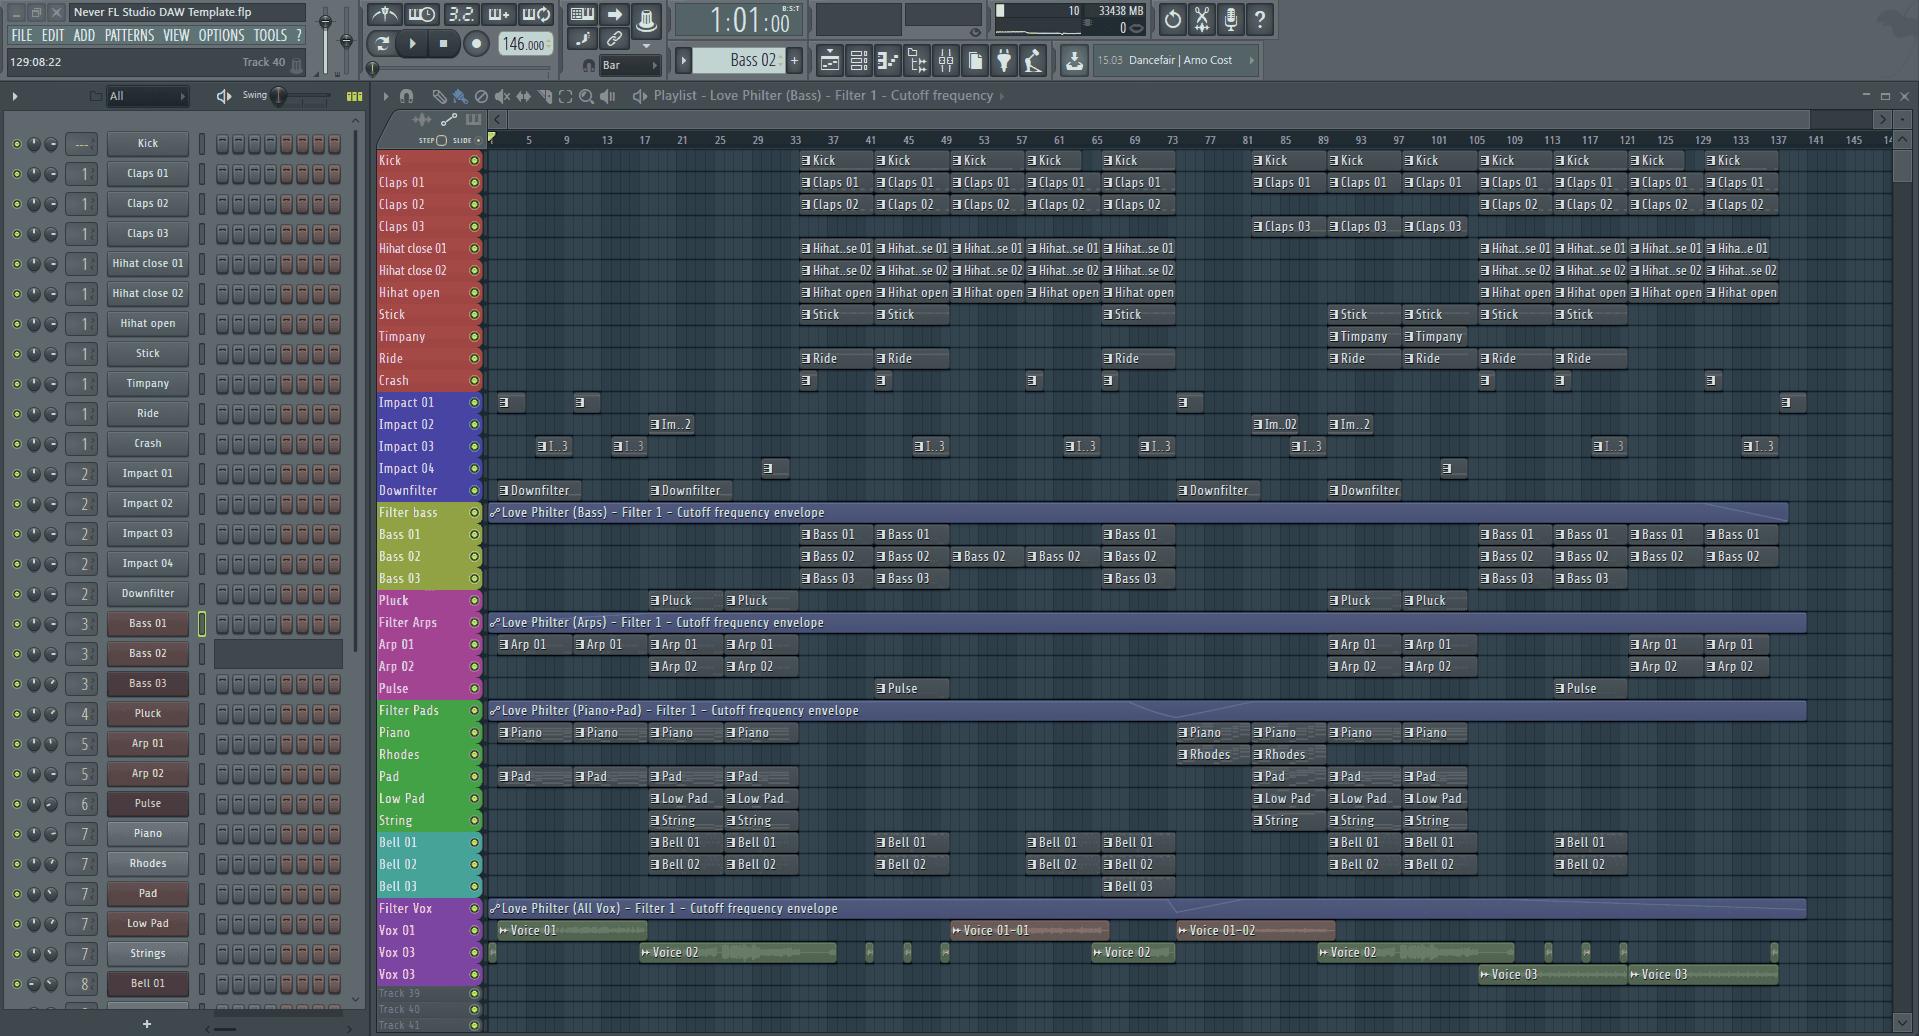 Never Fl Studio Daw Template